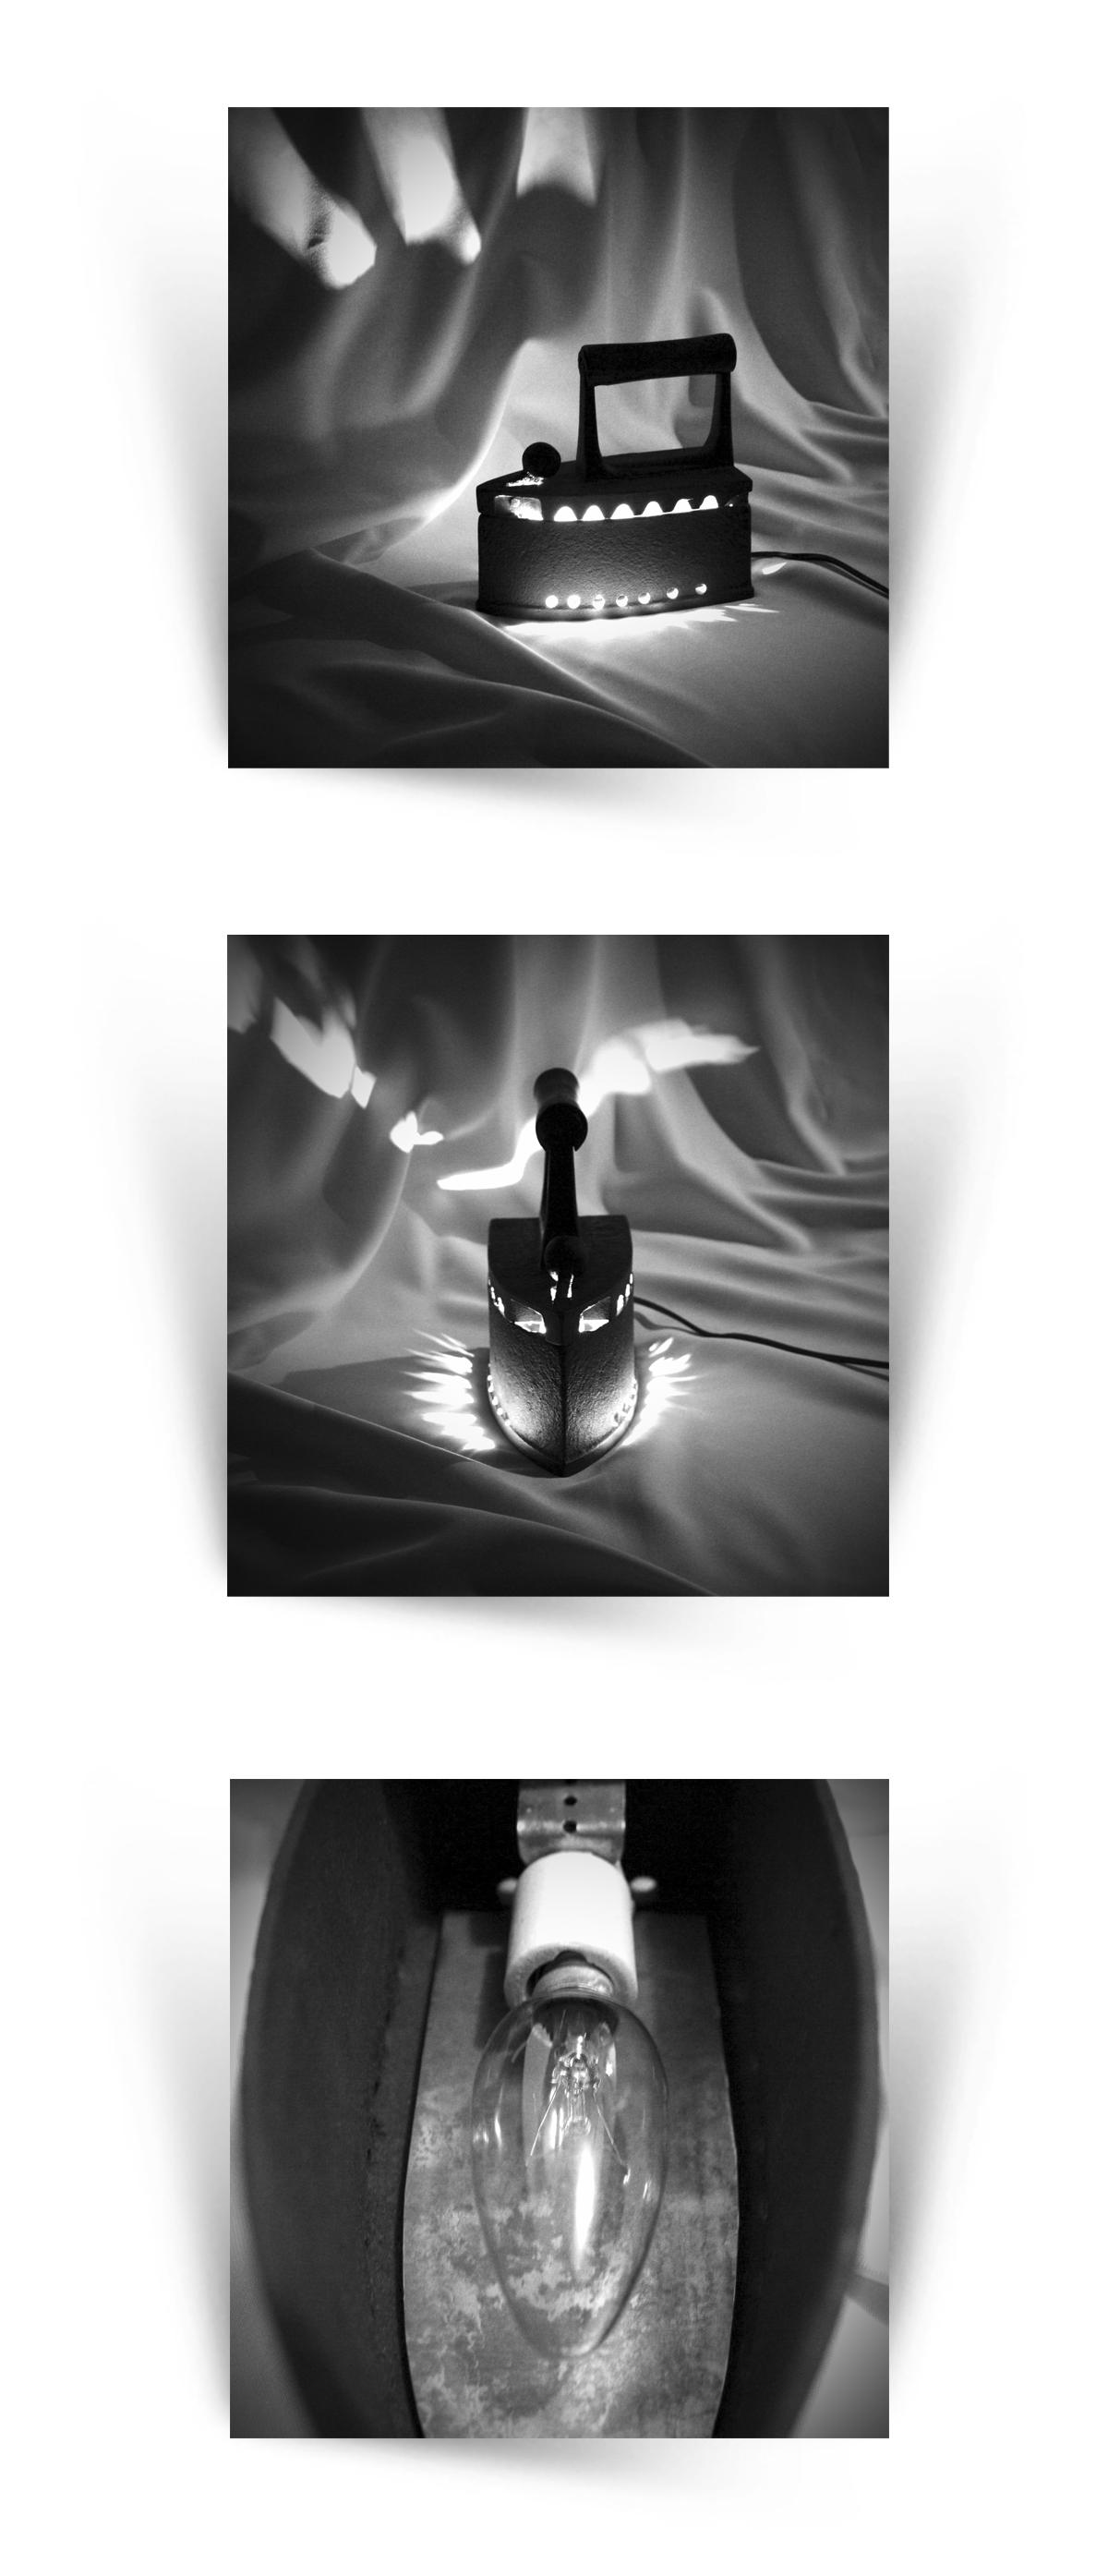 Jelizko - lamp